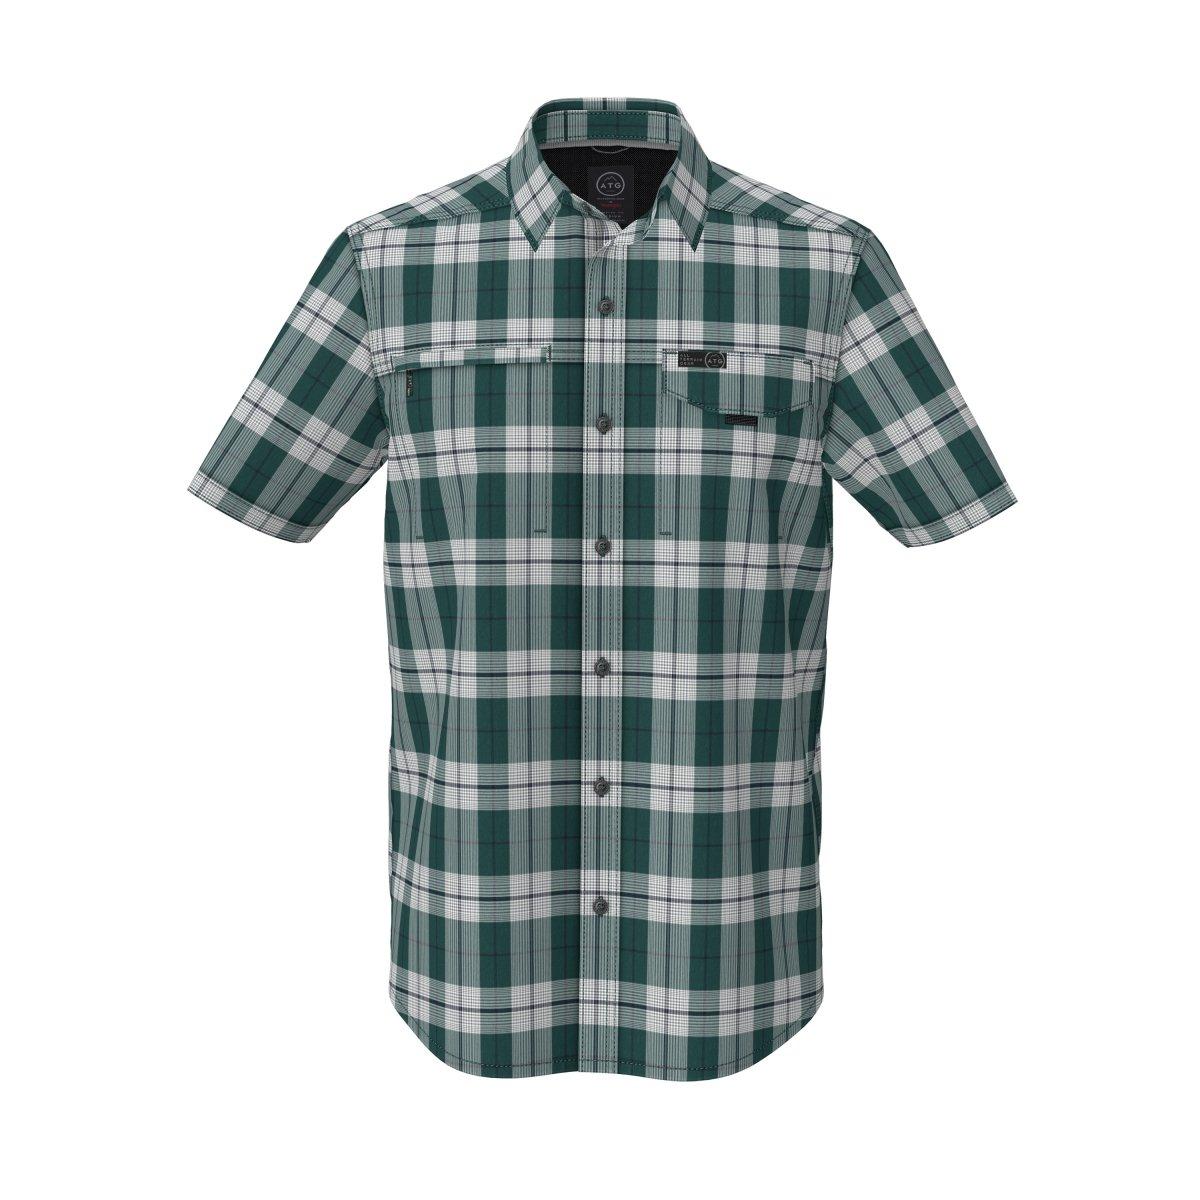 ATG X Asymmetric Zip Pocket Shirt from Wrangler